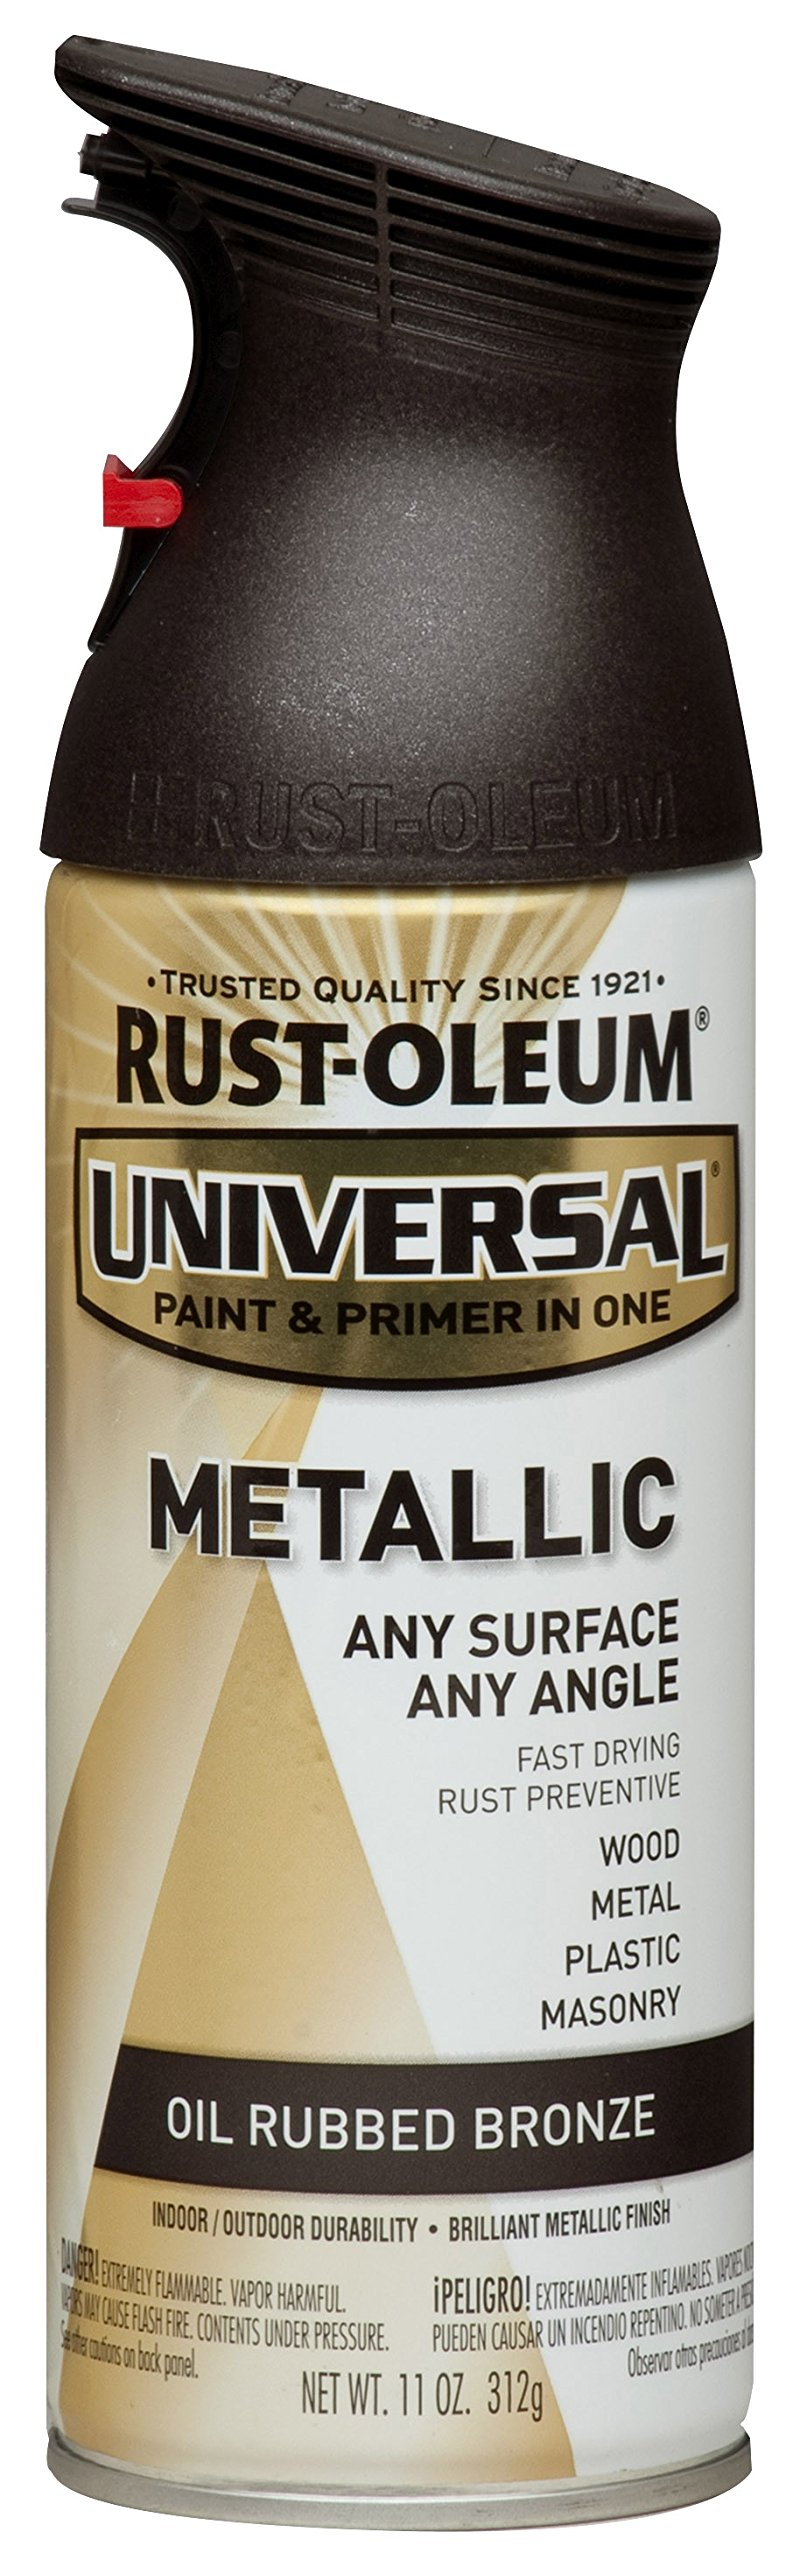 Amazon.com: Rust-Oleum 249131 11 oz Universal All Surface Spray ...